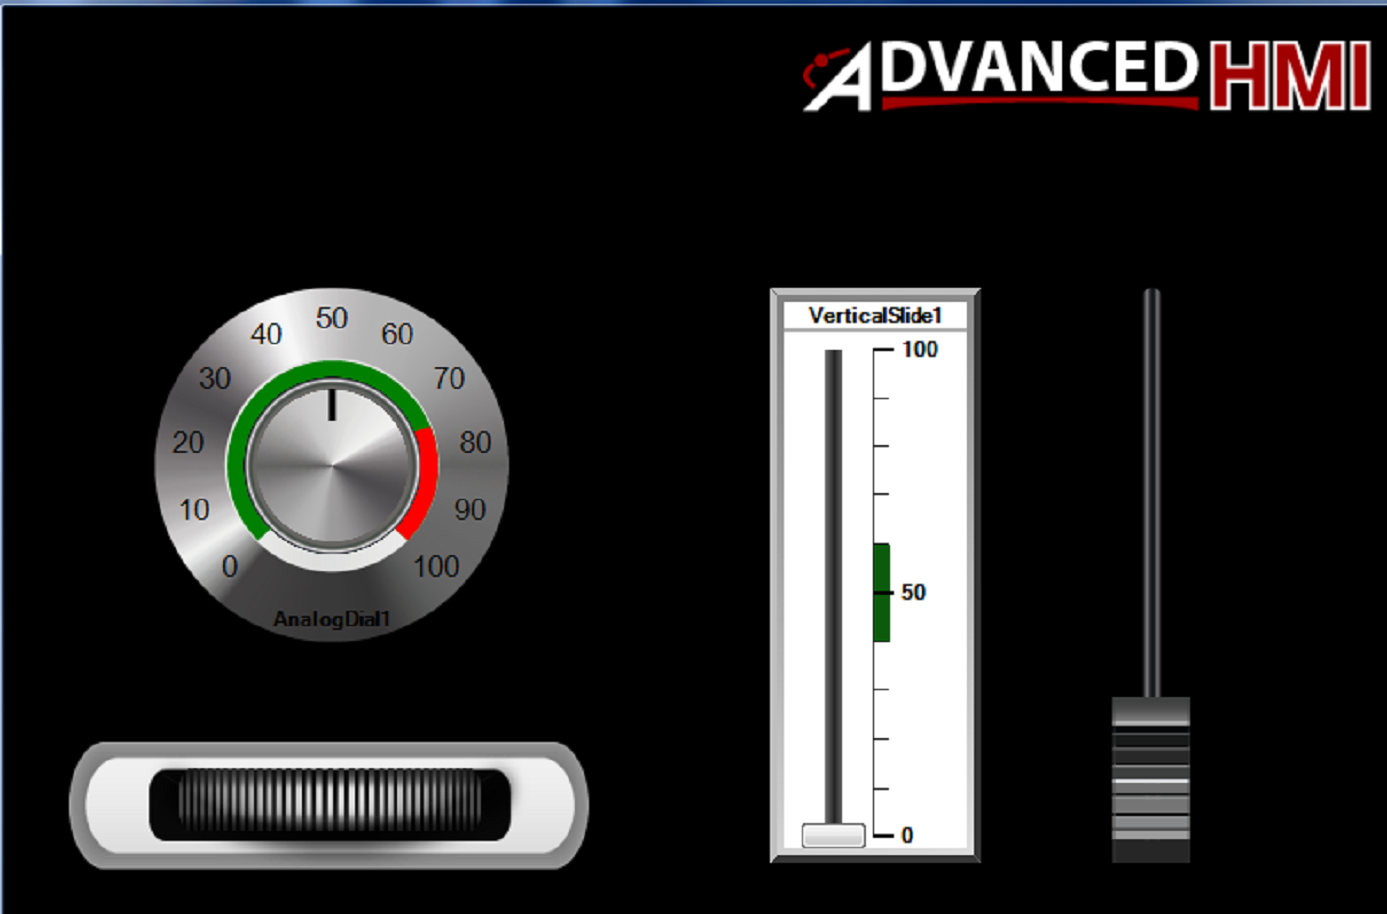 HMI Software by AdvancedHMI, Solution to Monitor and Control PLC Data